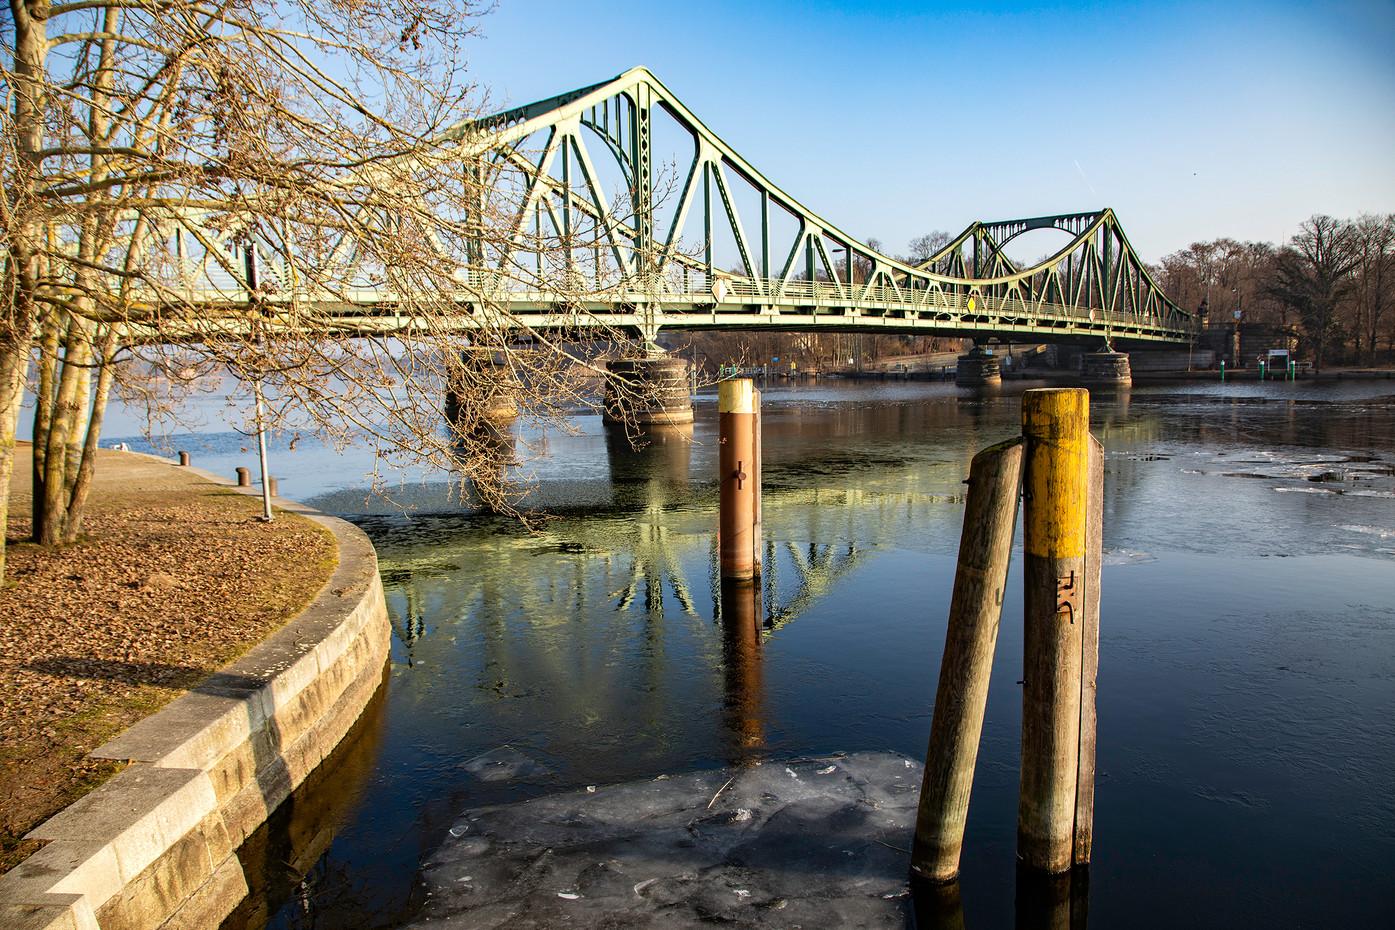 The Bridge of Spies in Potsdam, Germany